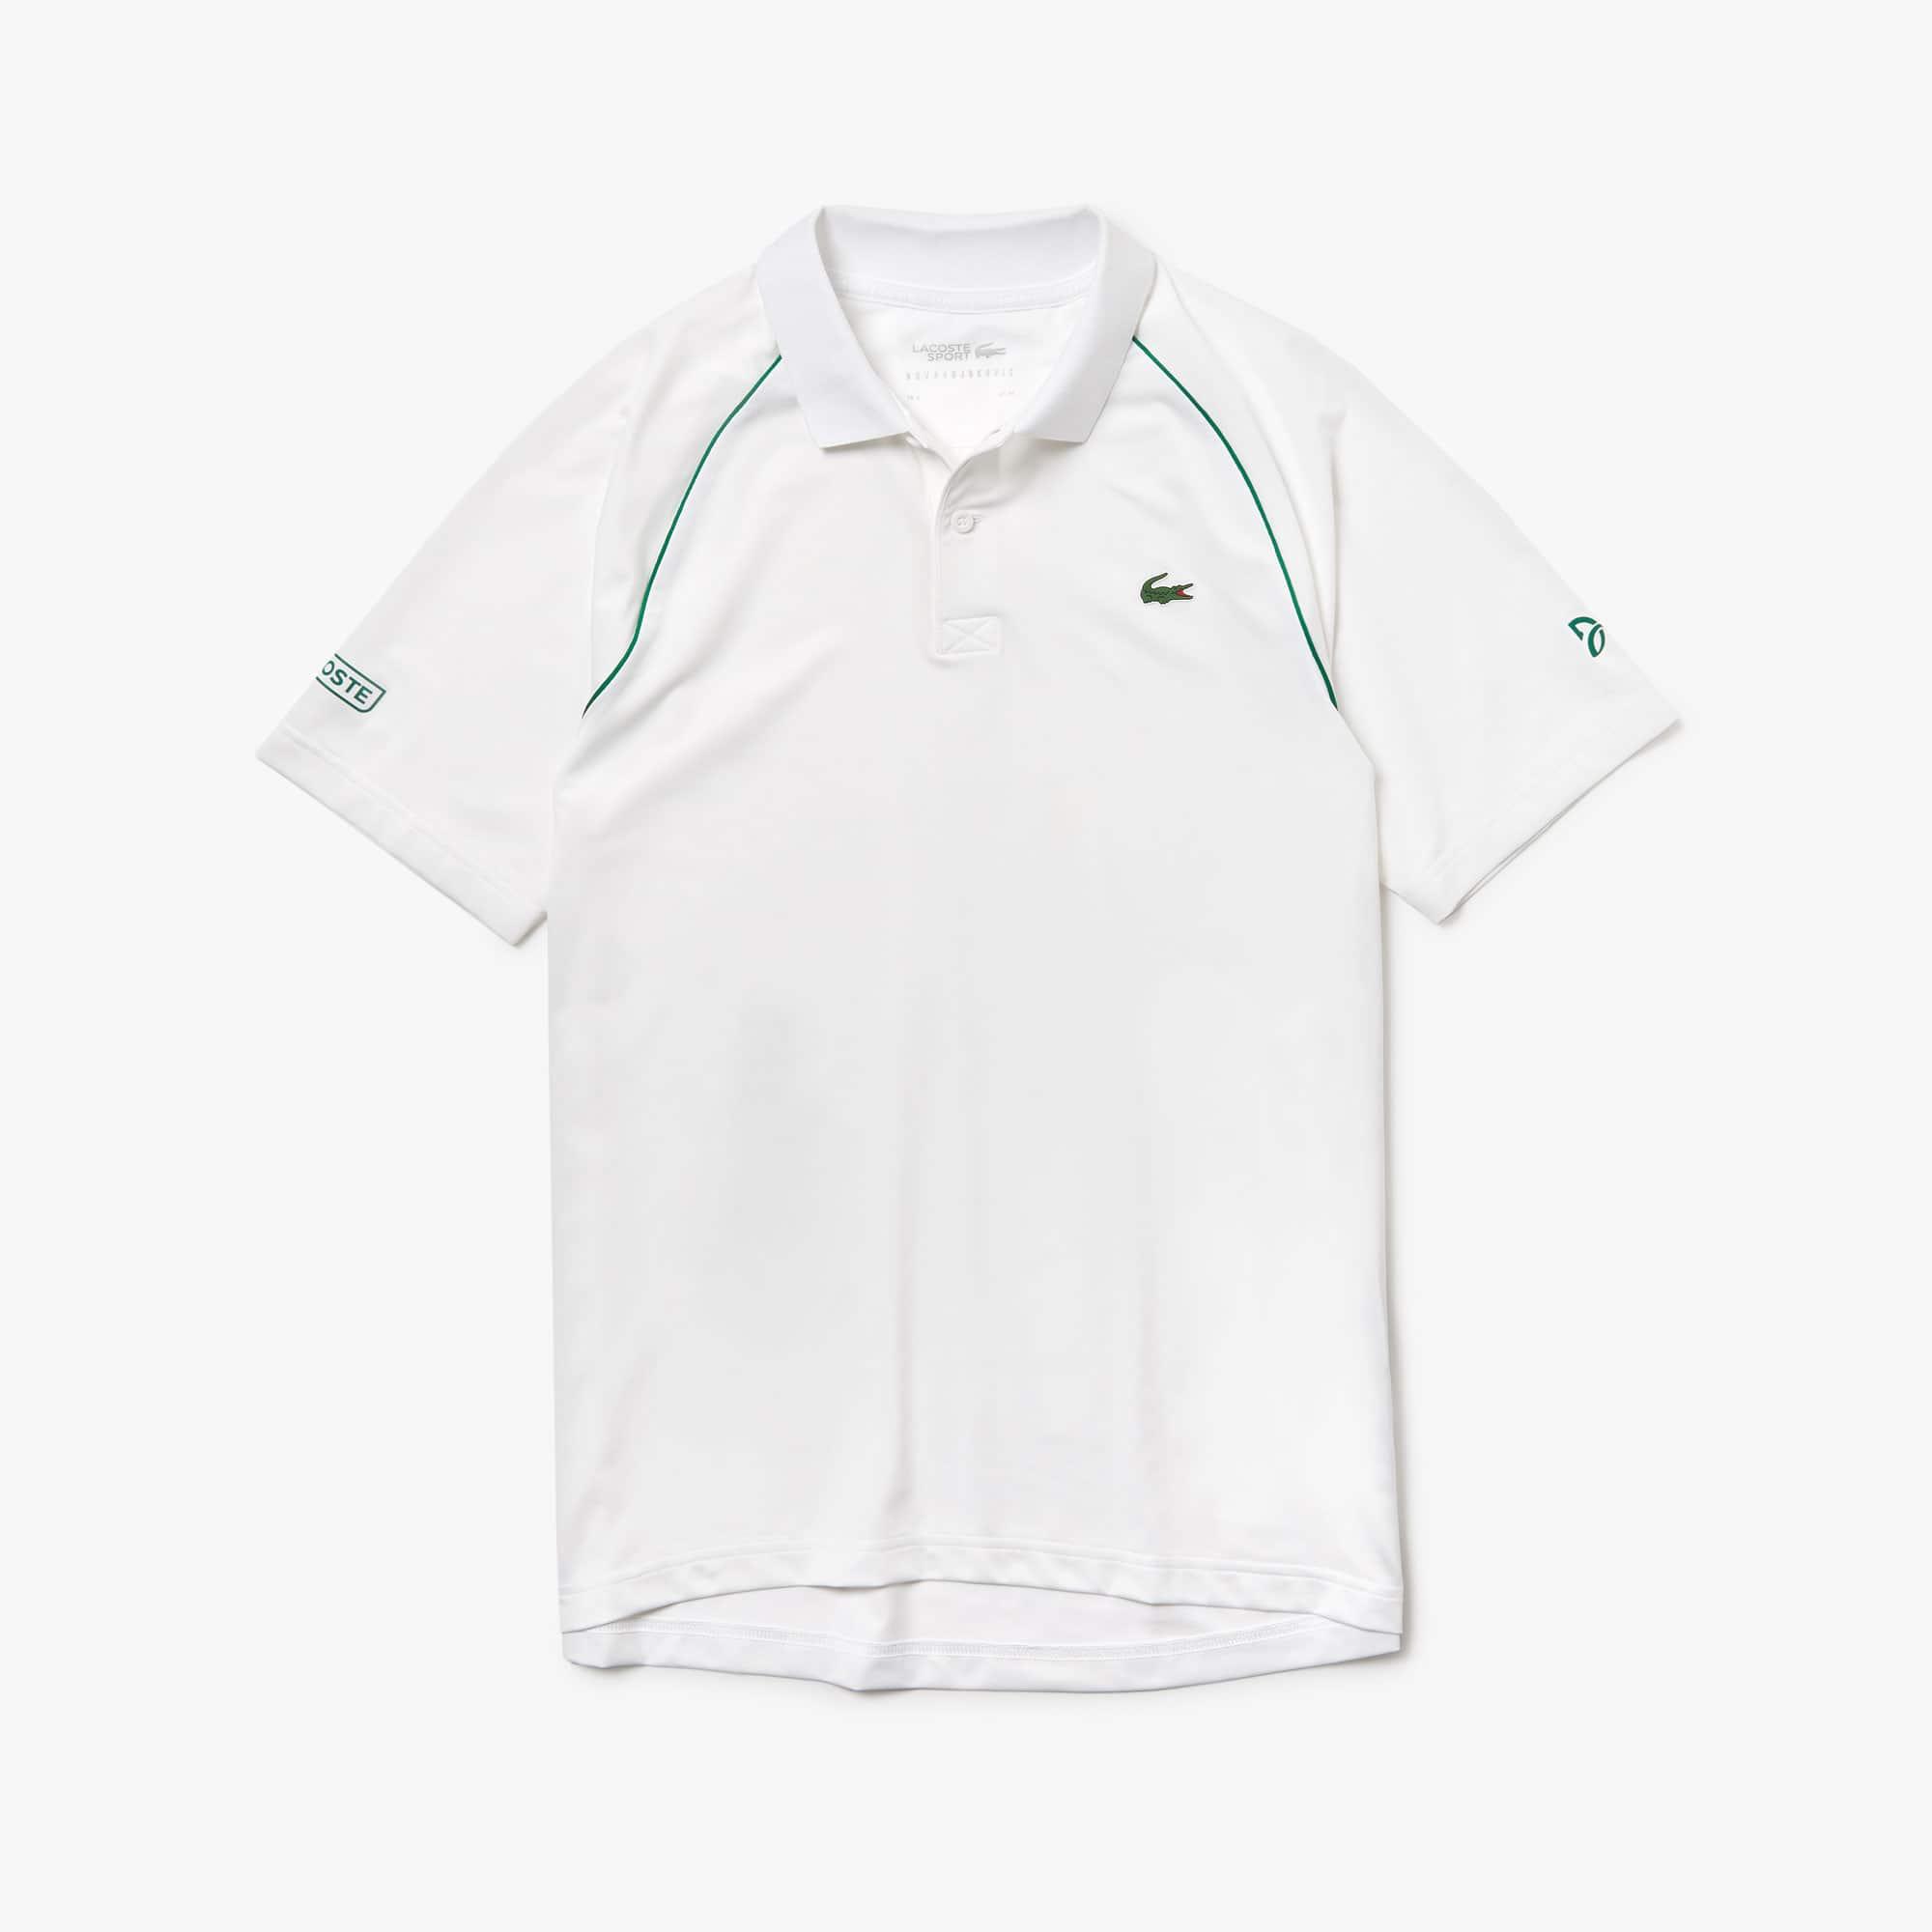 New Logo Novak Djokovic Tennis Champions T-Shirt Sport Winner Mens Shirt S-2XL